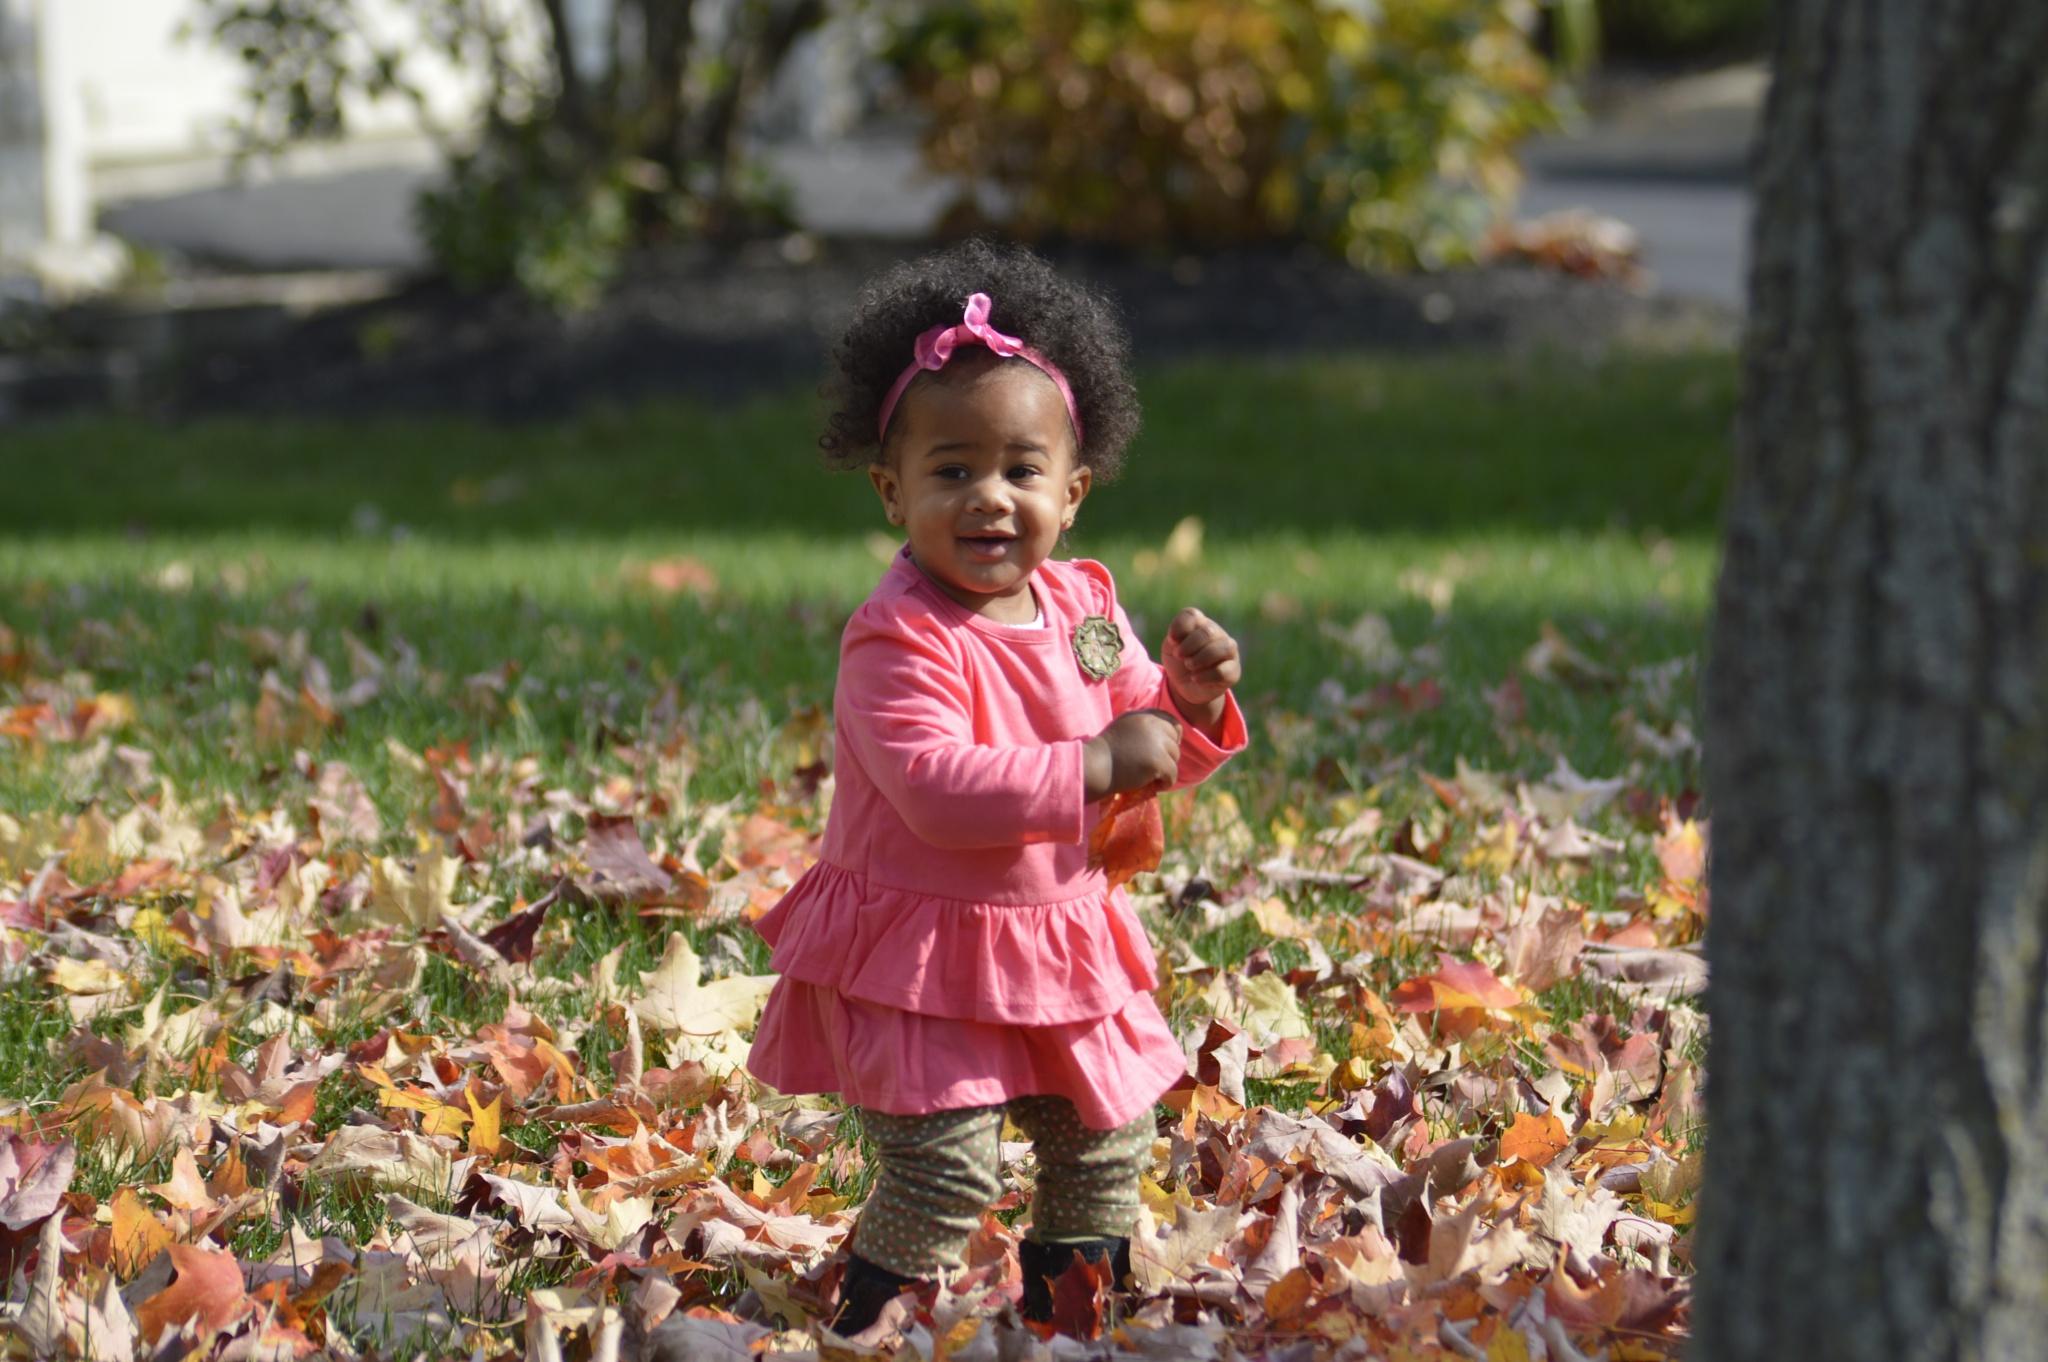 Enjoying the Autumn Leaves by Angela McIntosh